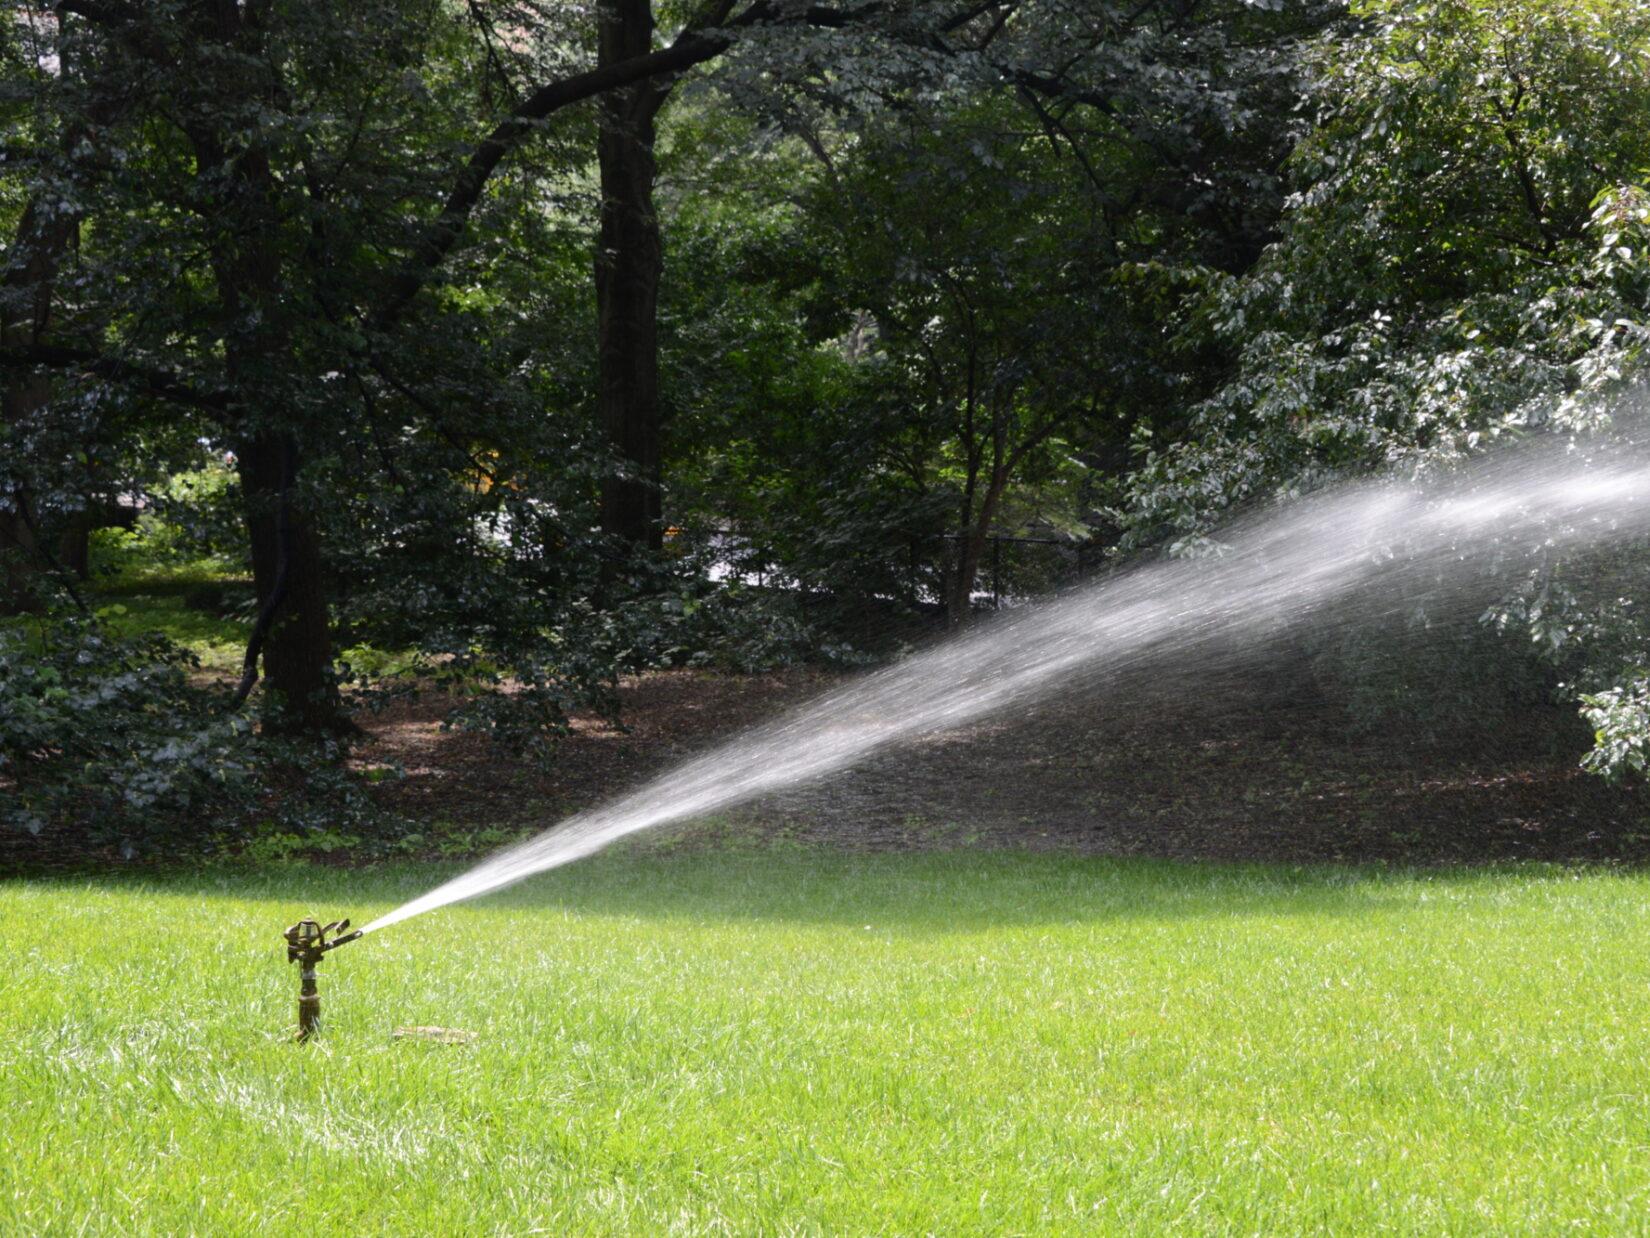 A sprinkler waters a lawn